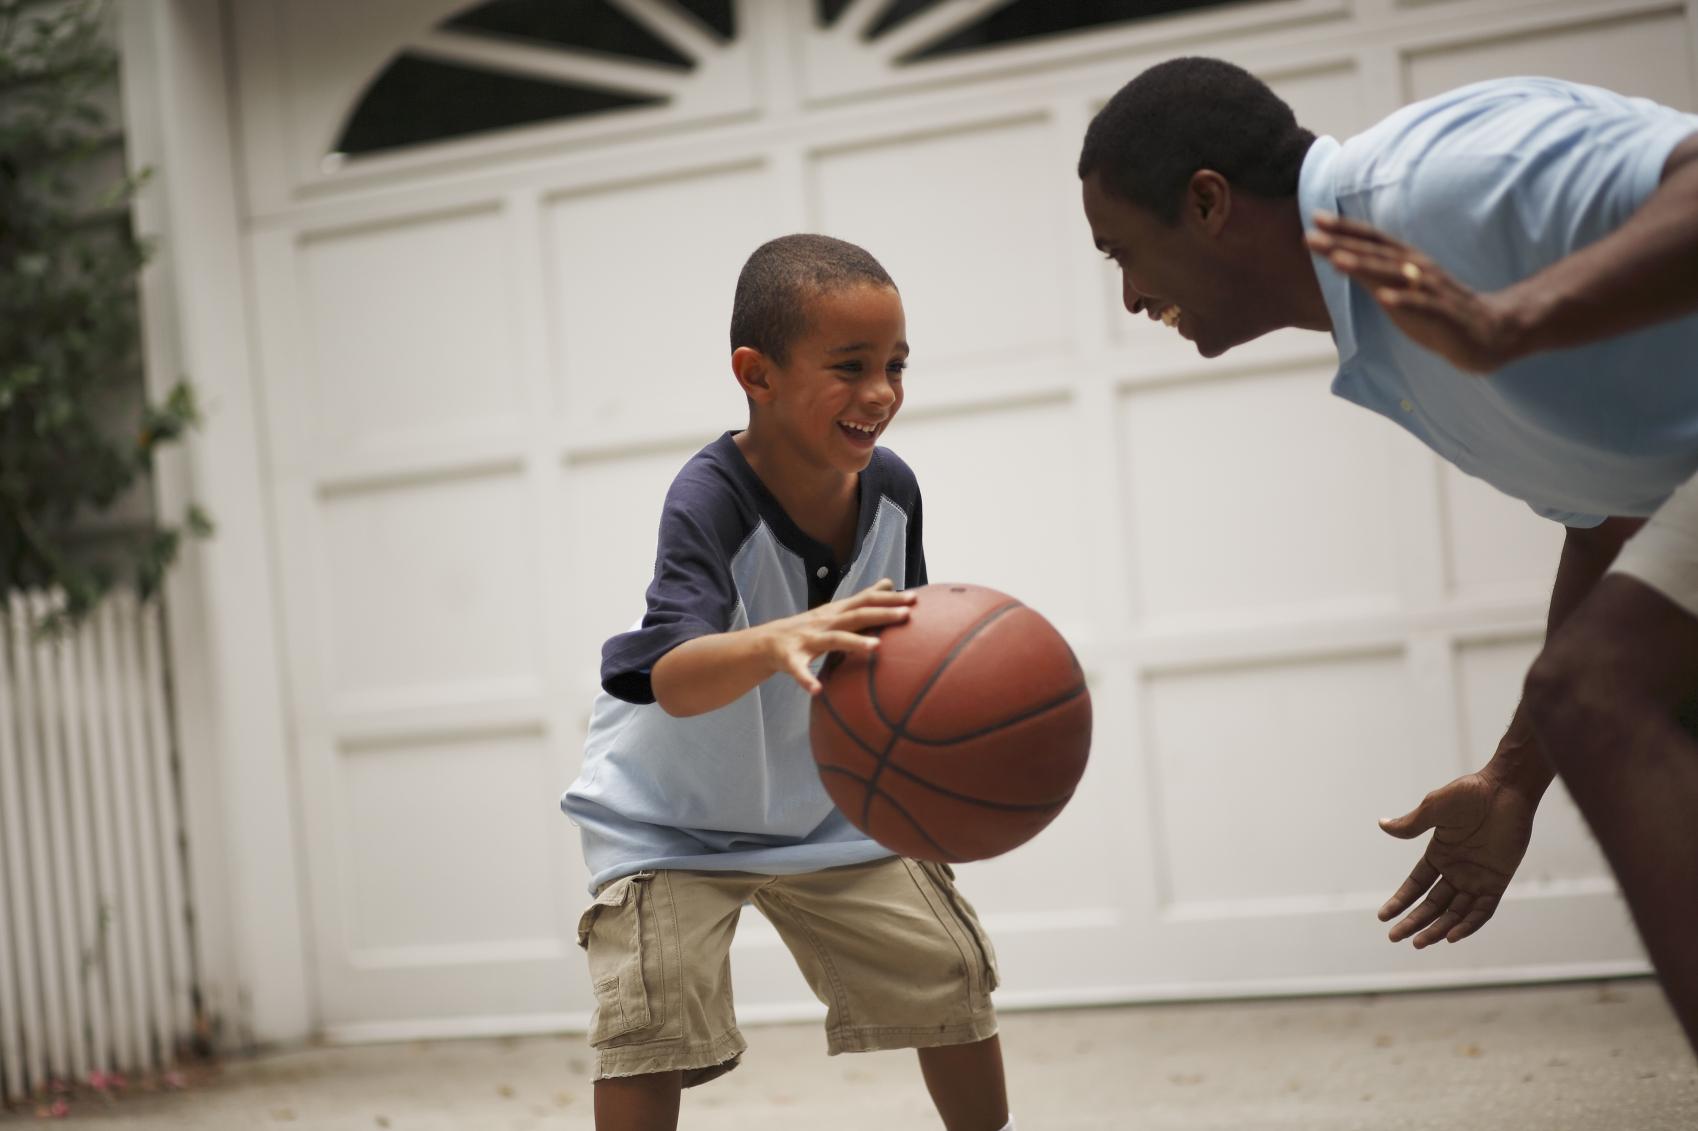 Youth mentor program pair